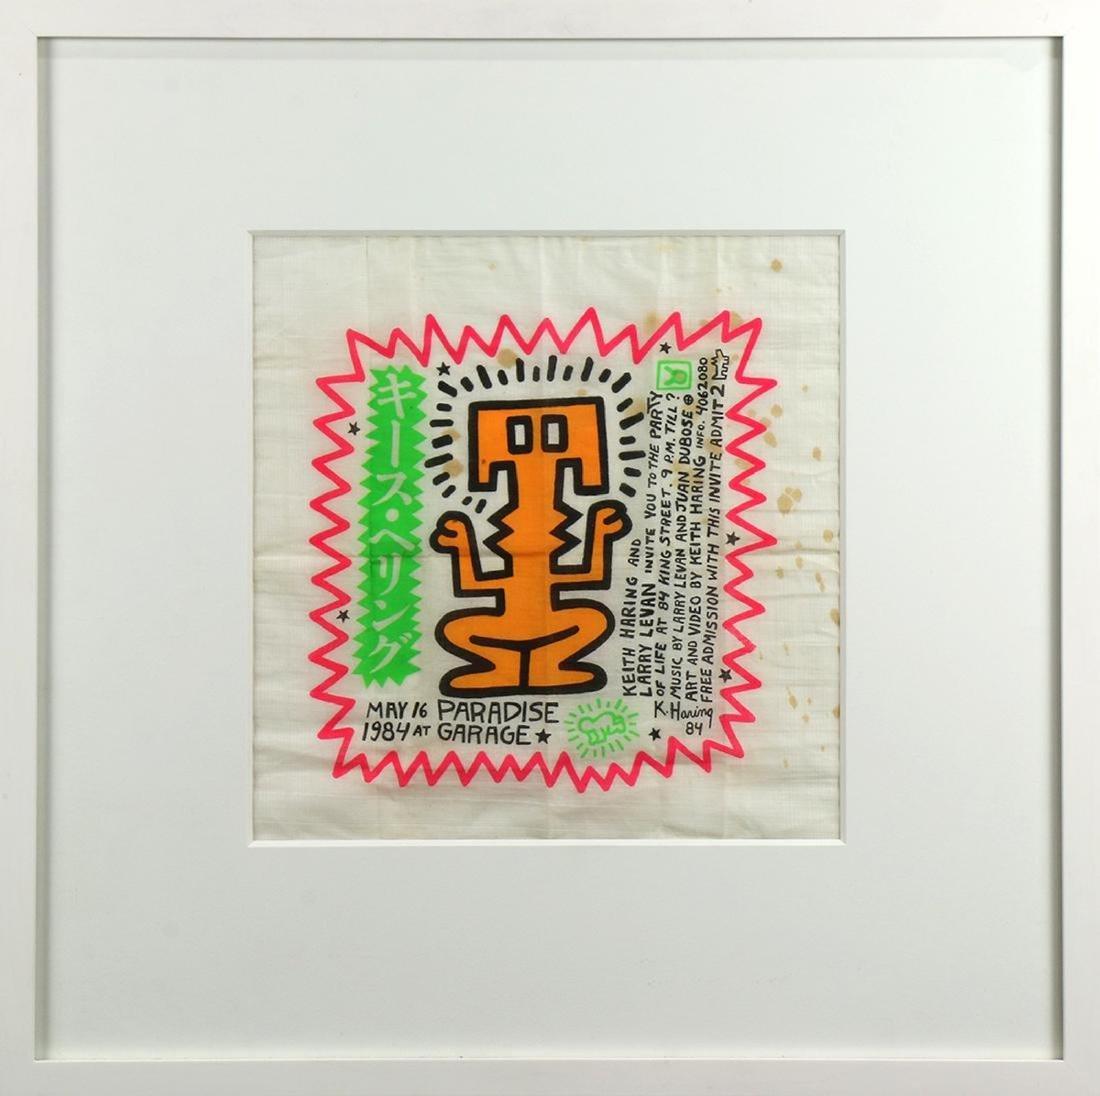 Keith Haring 1958-1990 (American) - 2